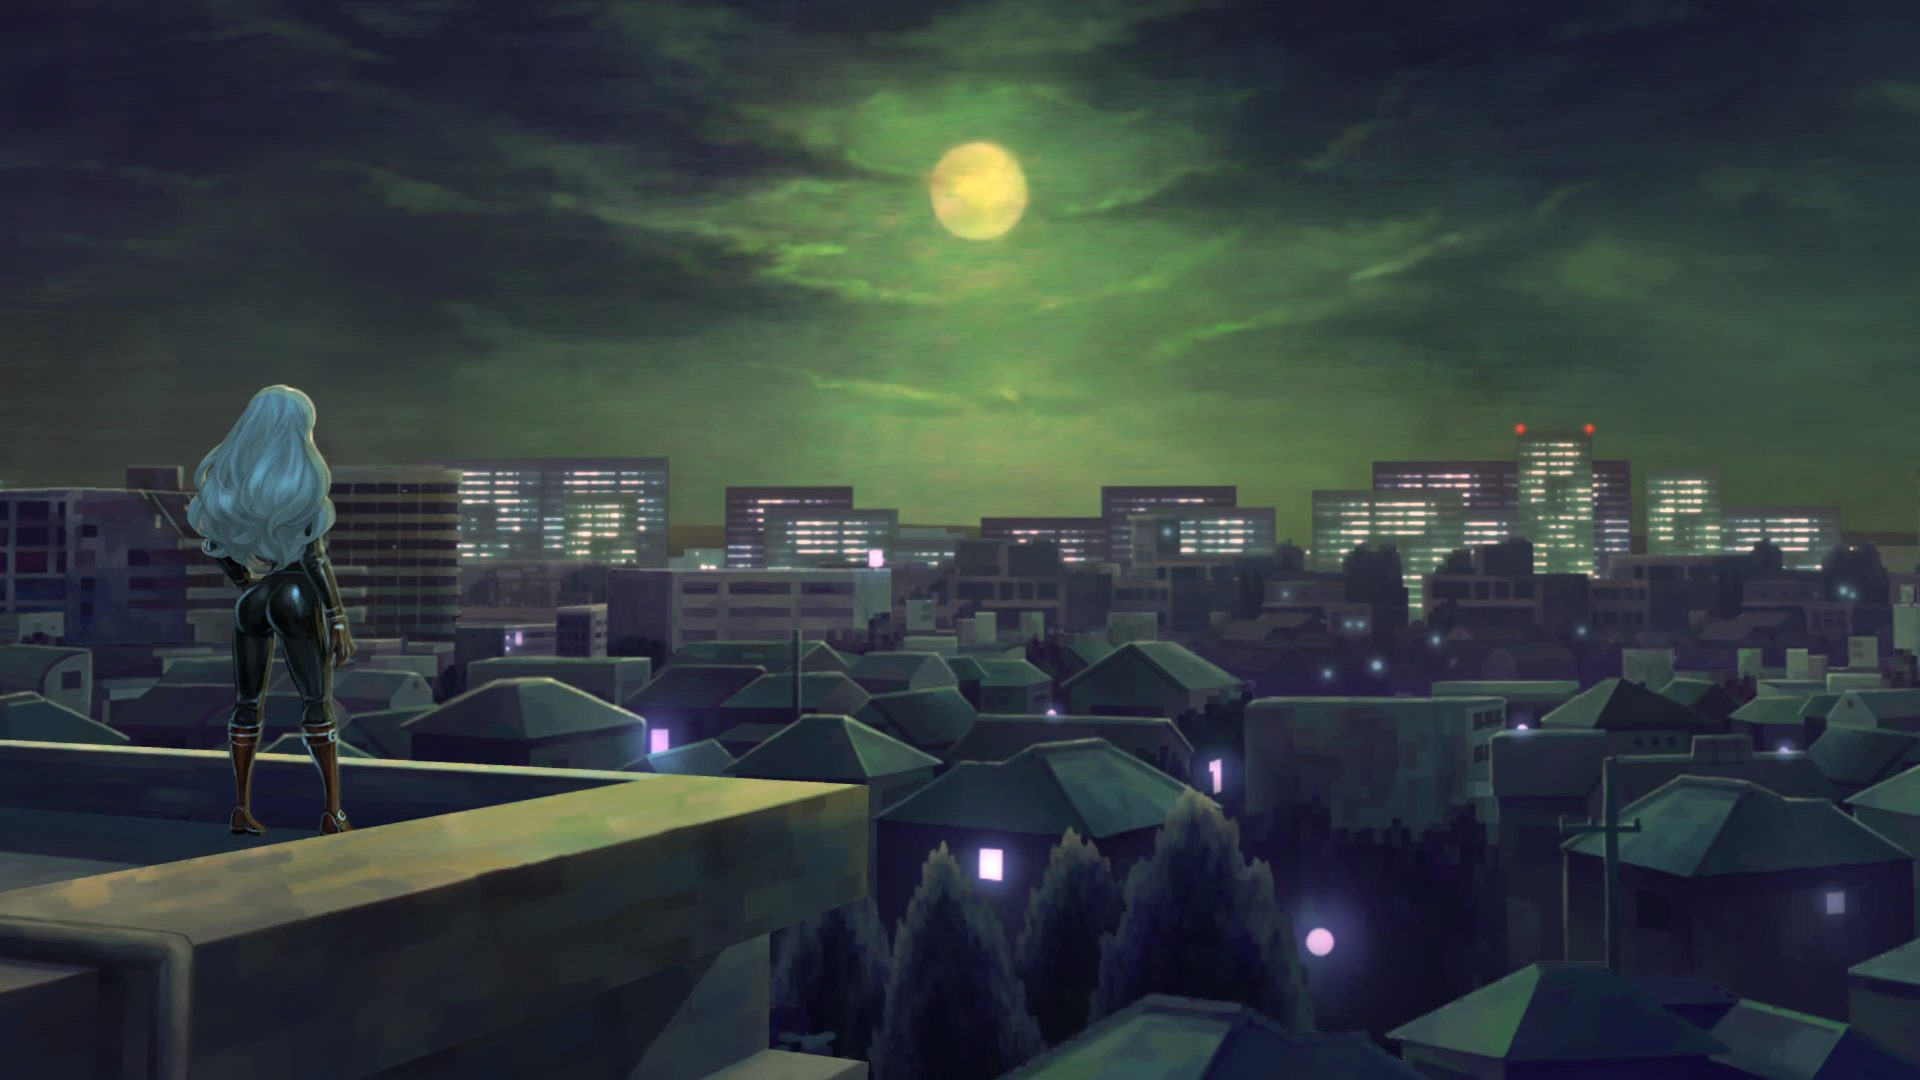 13 Sentinels: Aegis Rim - recenzja gry - rascal.pl